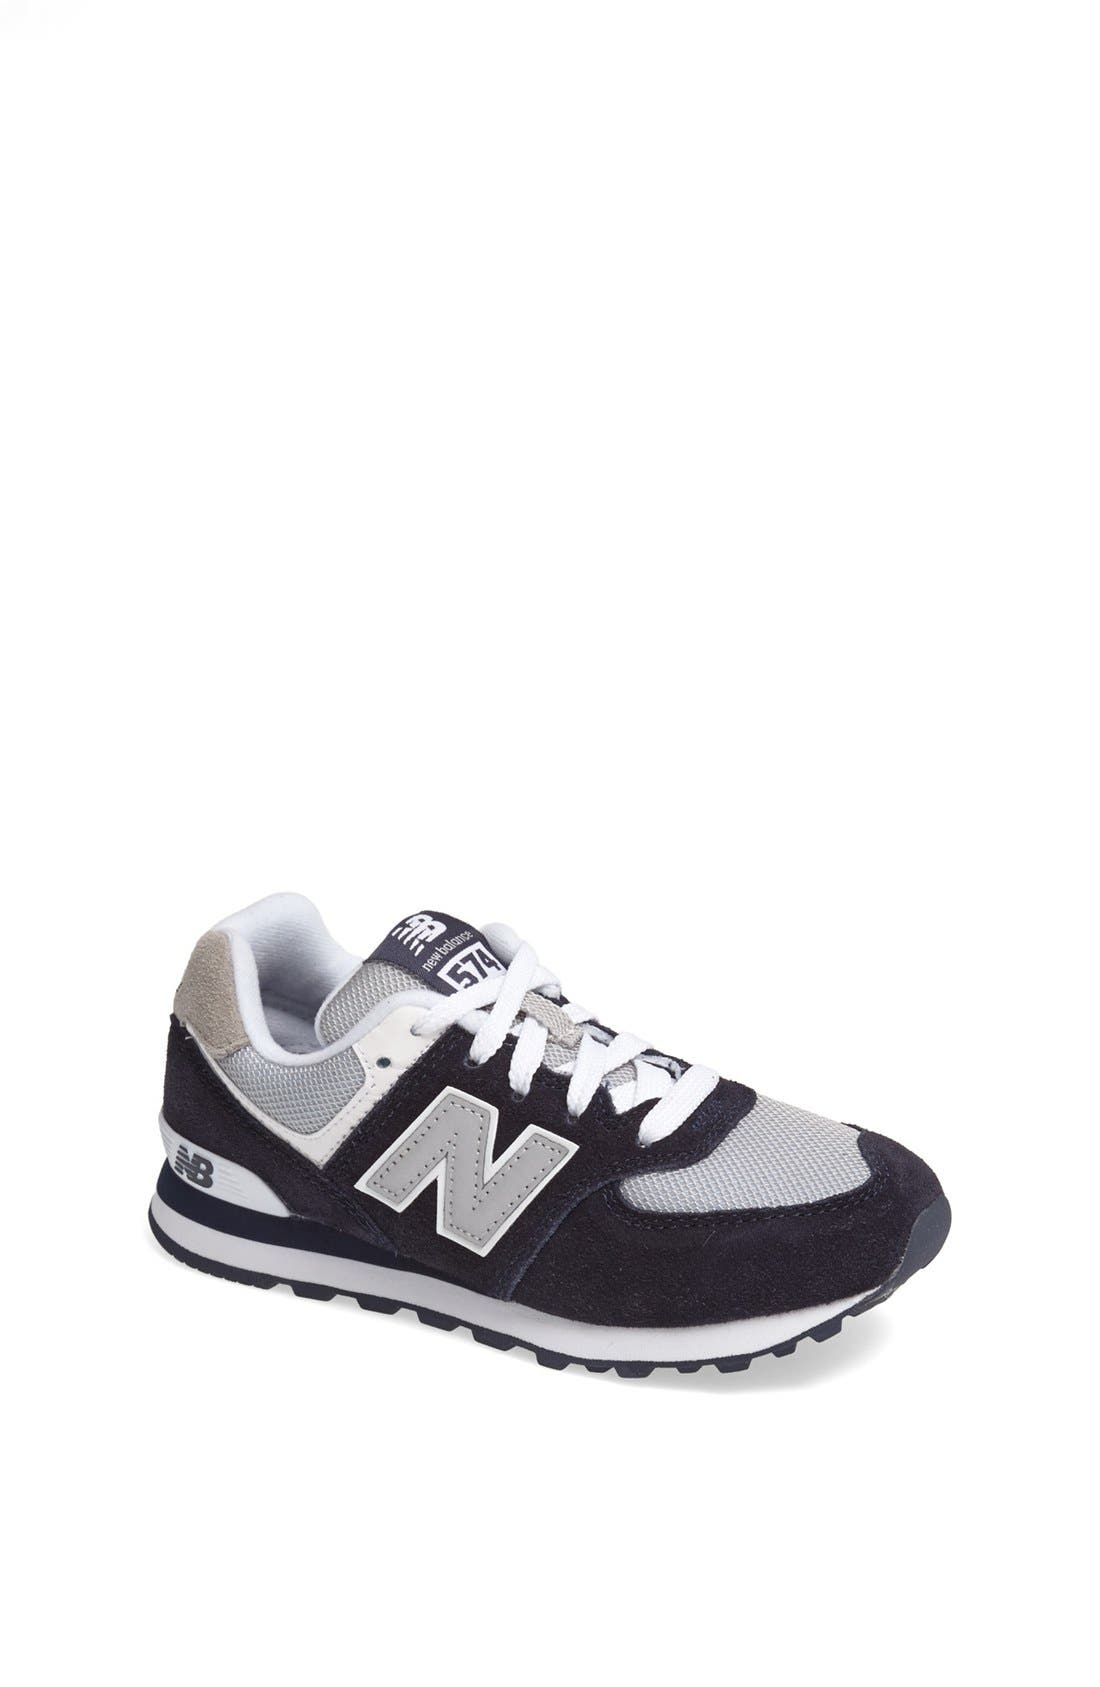 Alternate Image 1 Selected - New Balance '574 Classic' Sneaker (Toddler & Little Kid)